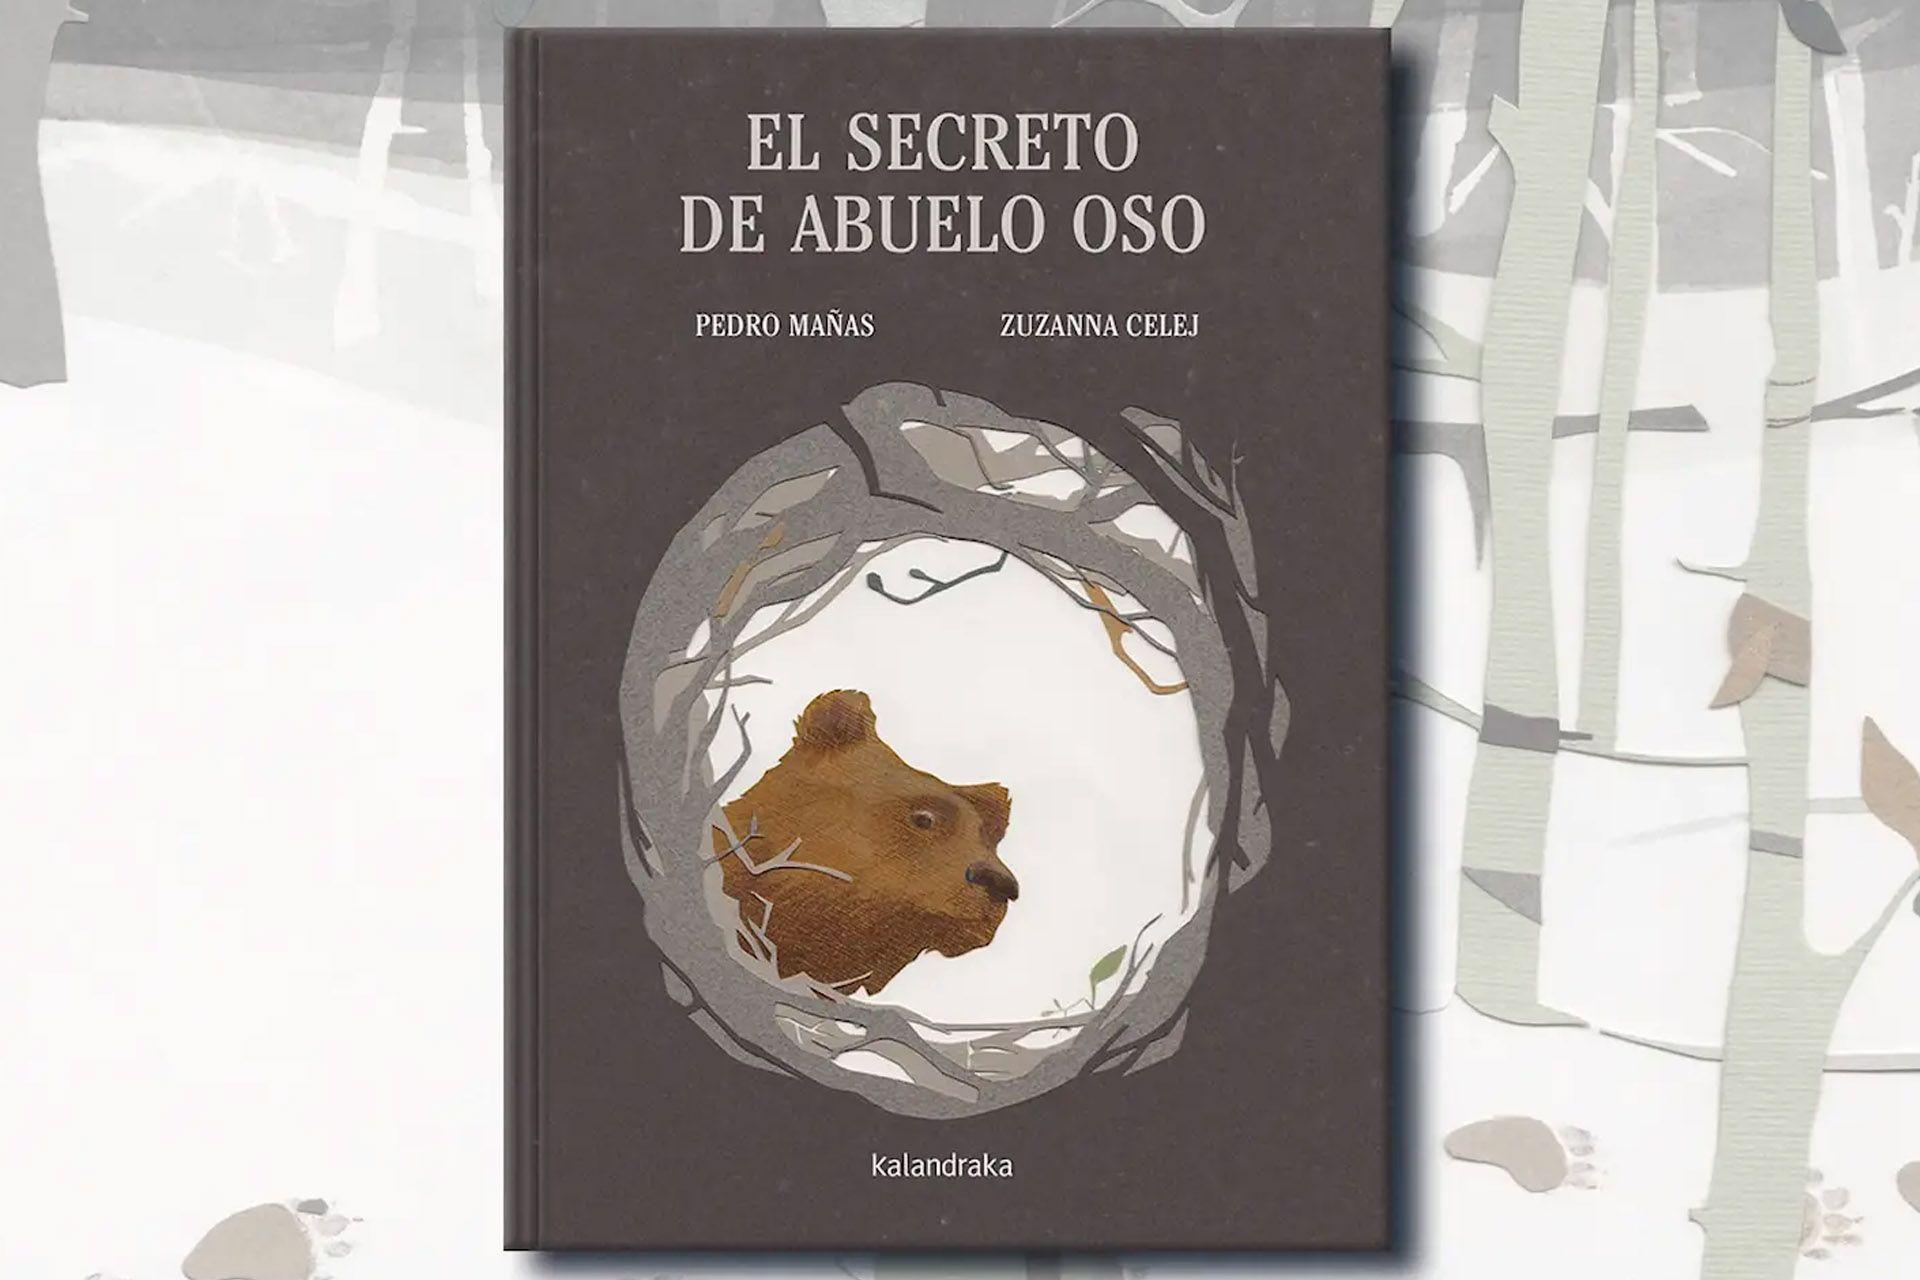 EL SECRETO DEL ABUELO OSO